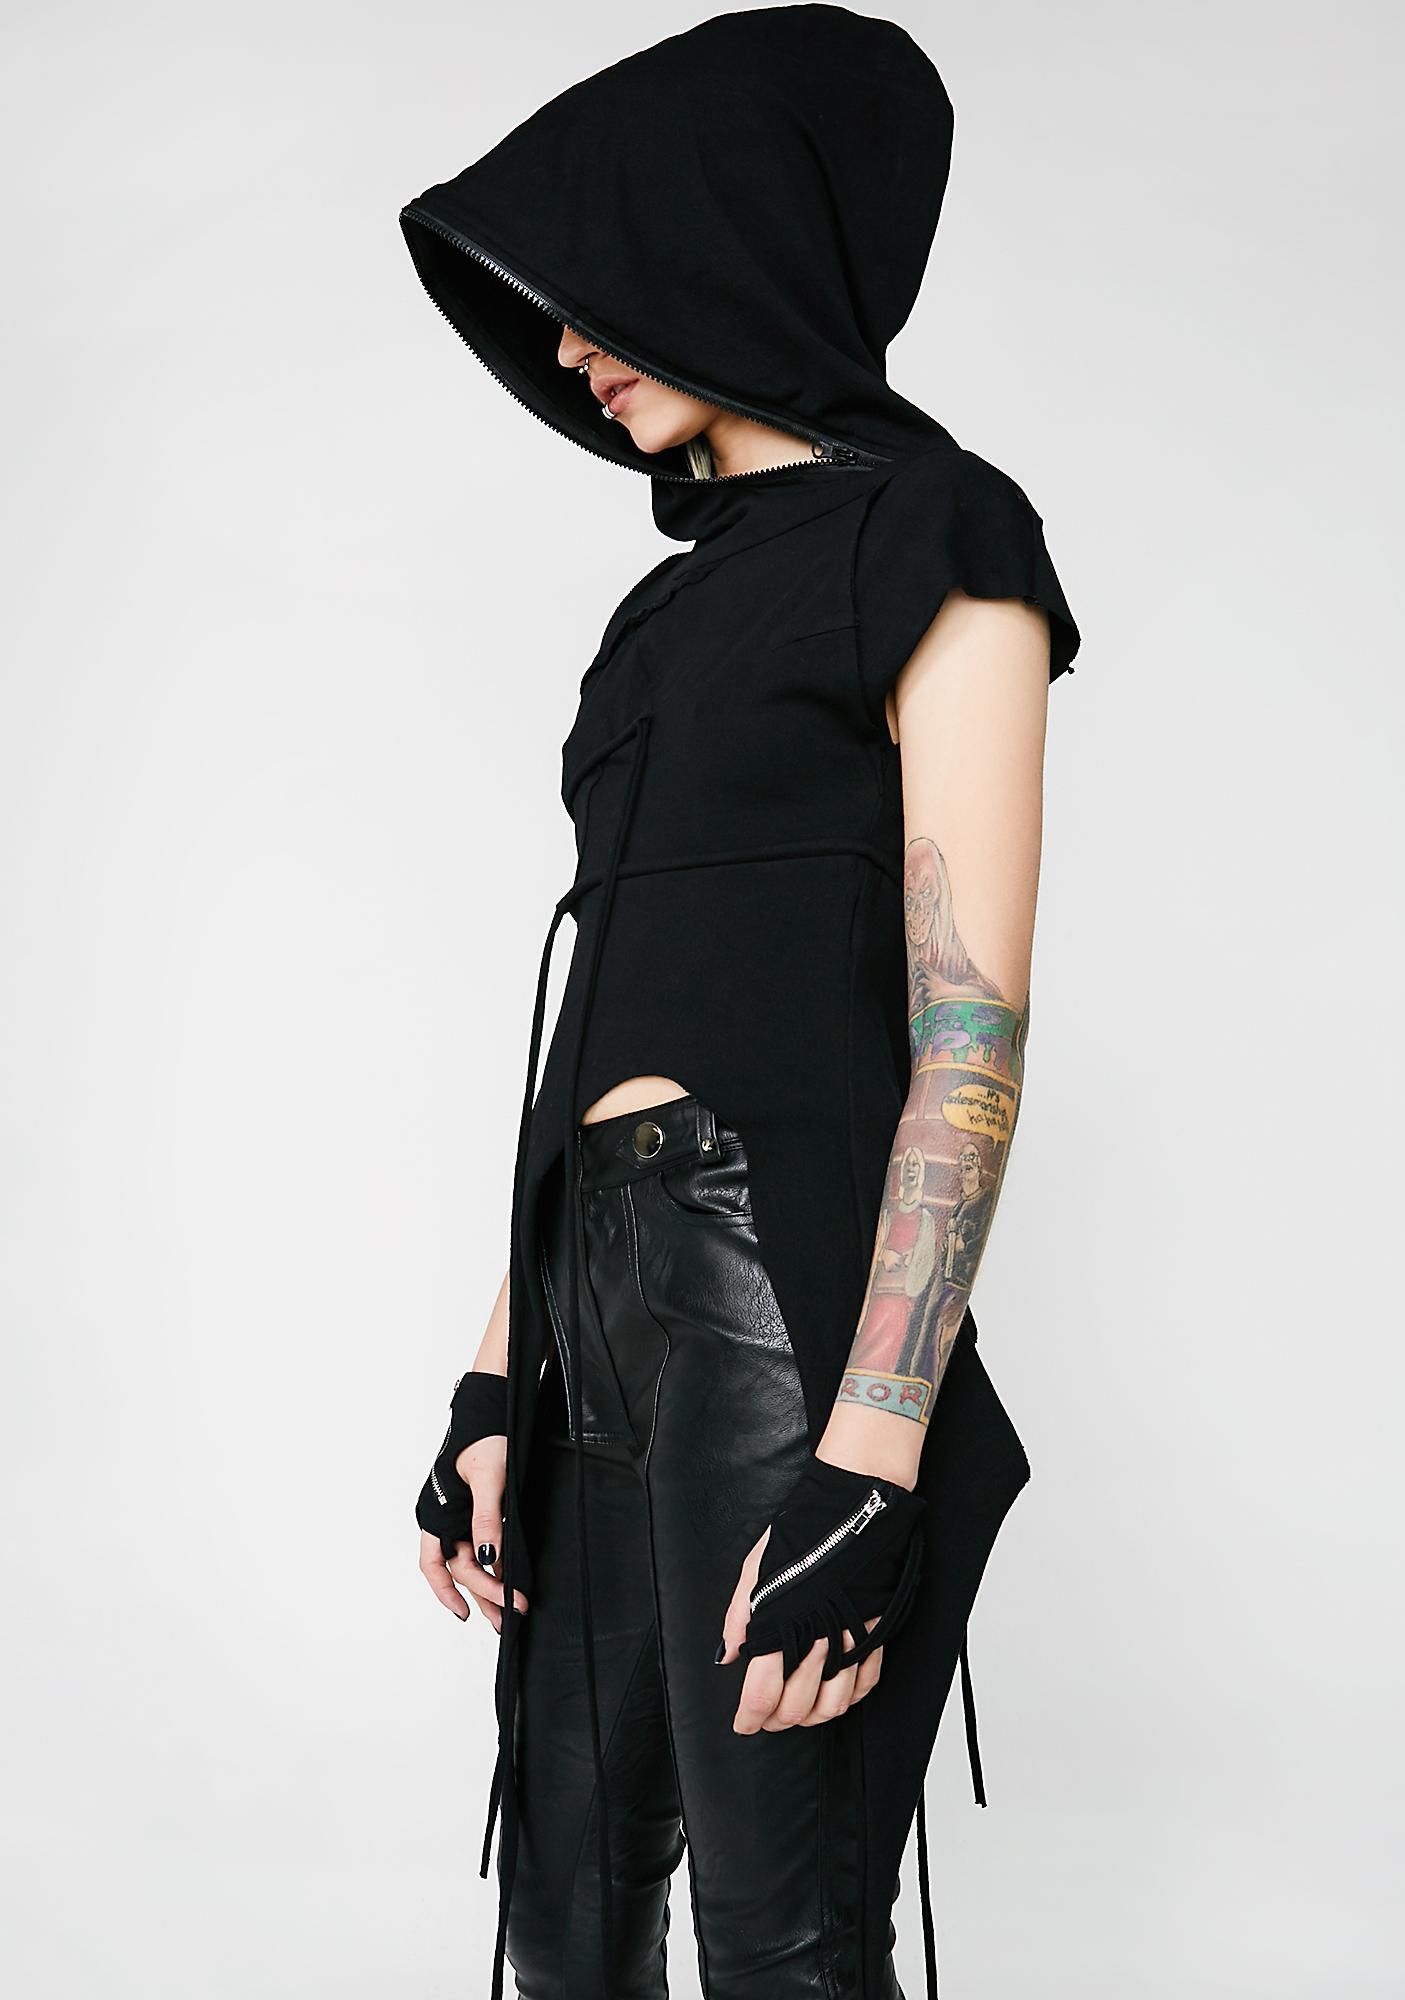 Punk Rave Punk Slant Hat Mosaic Tee